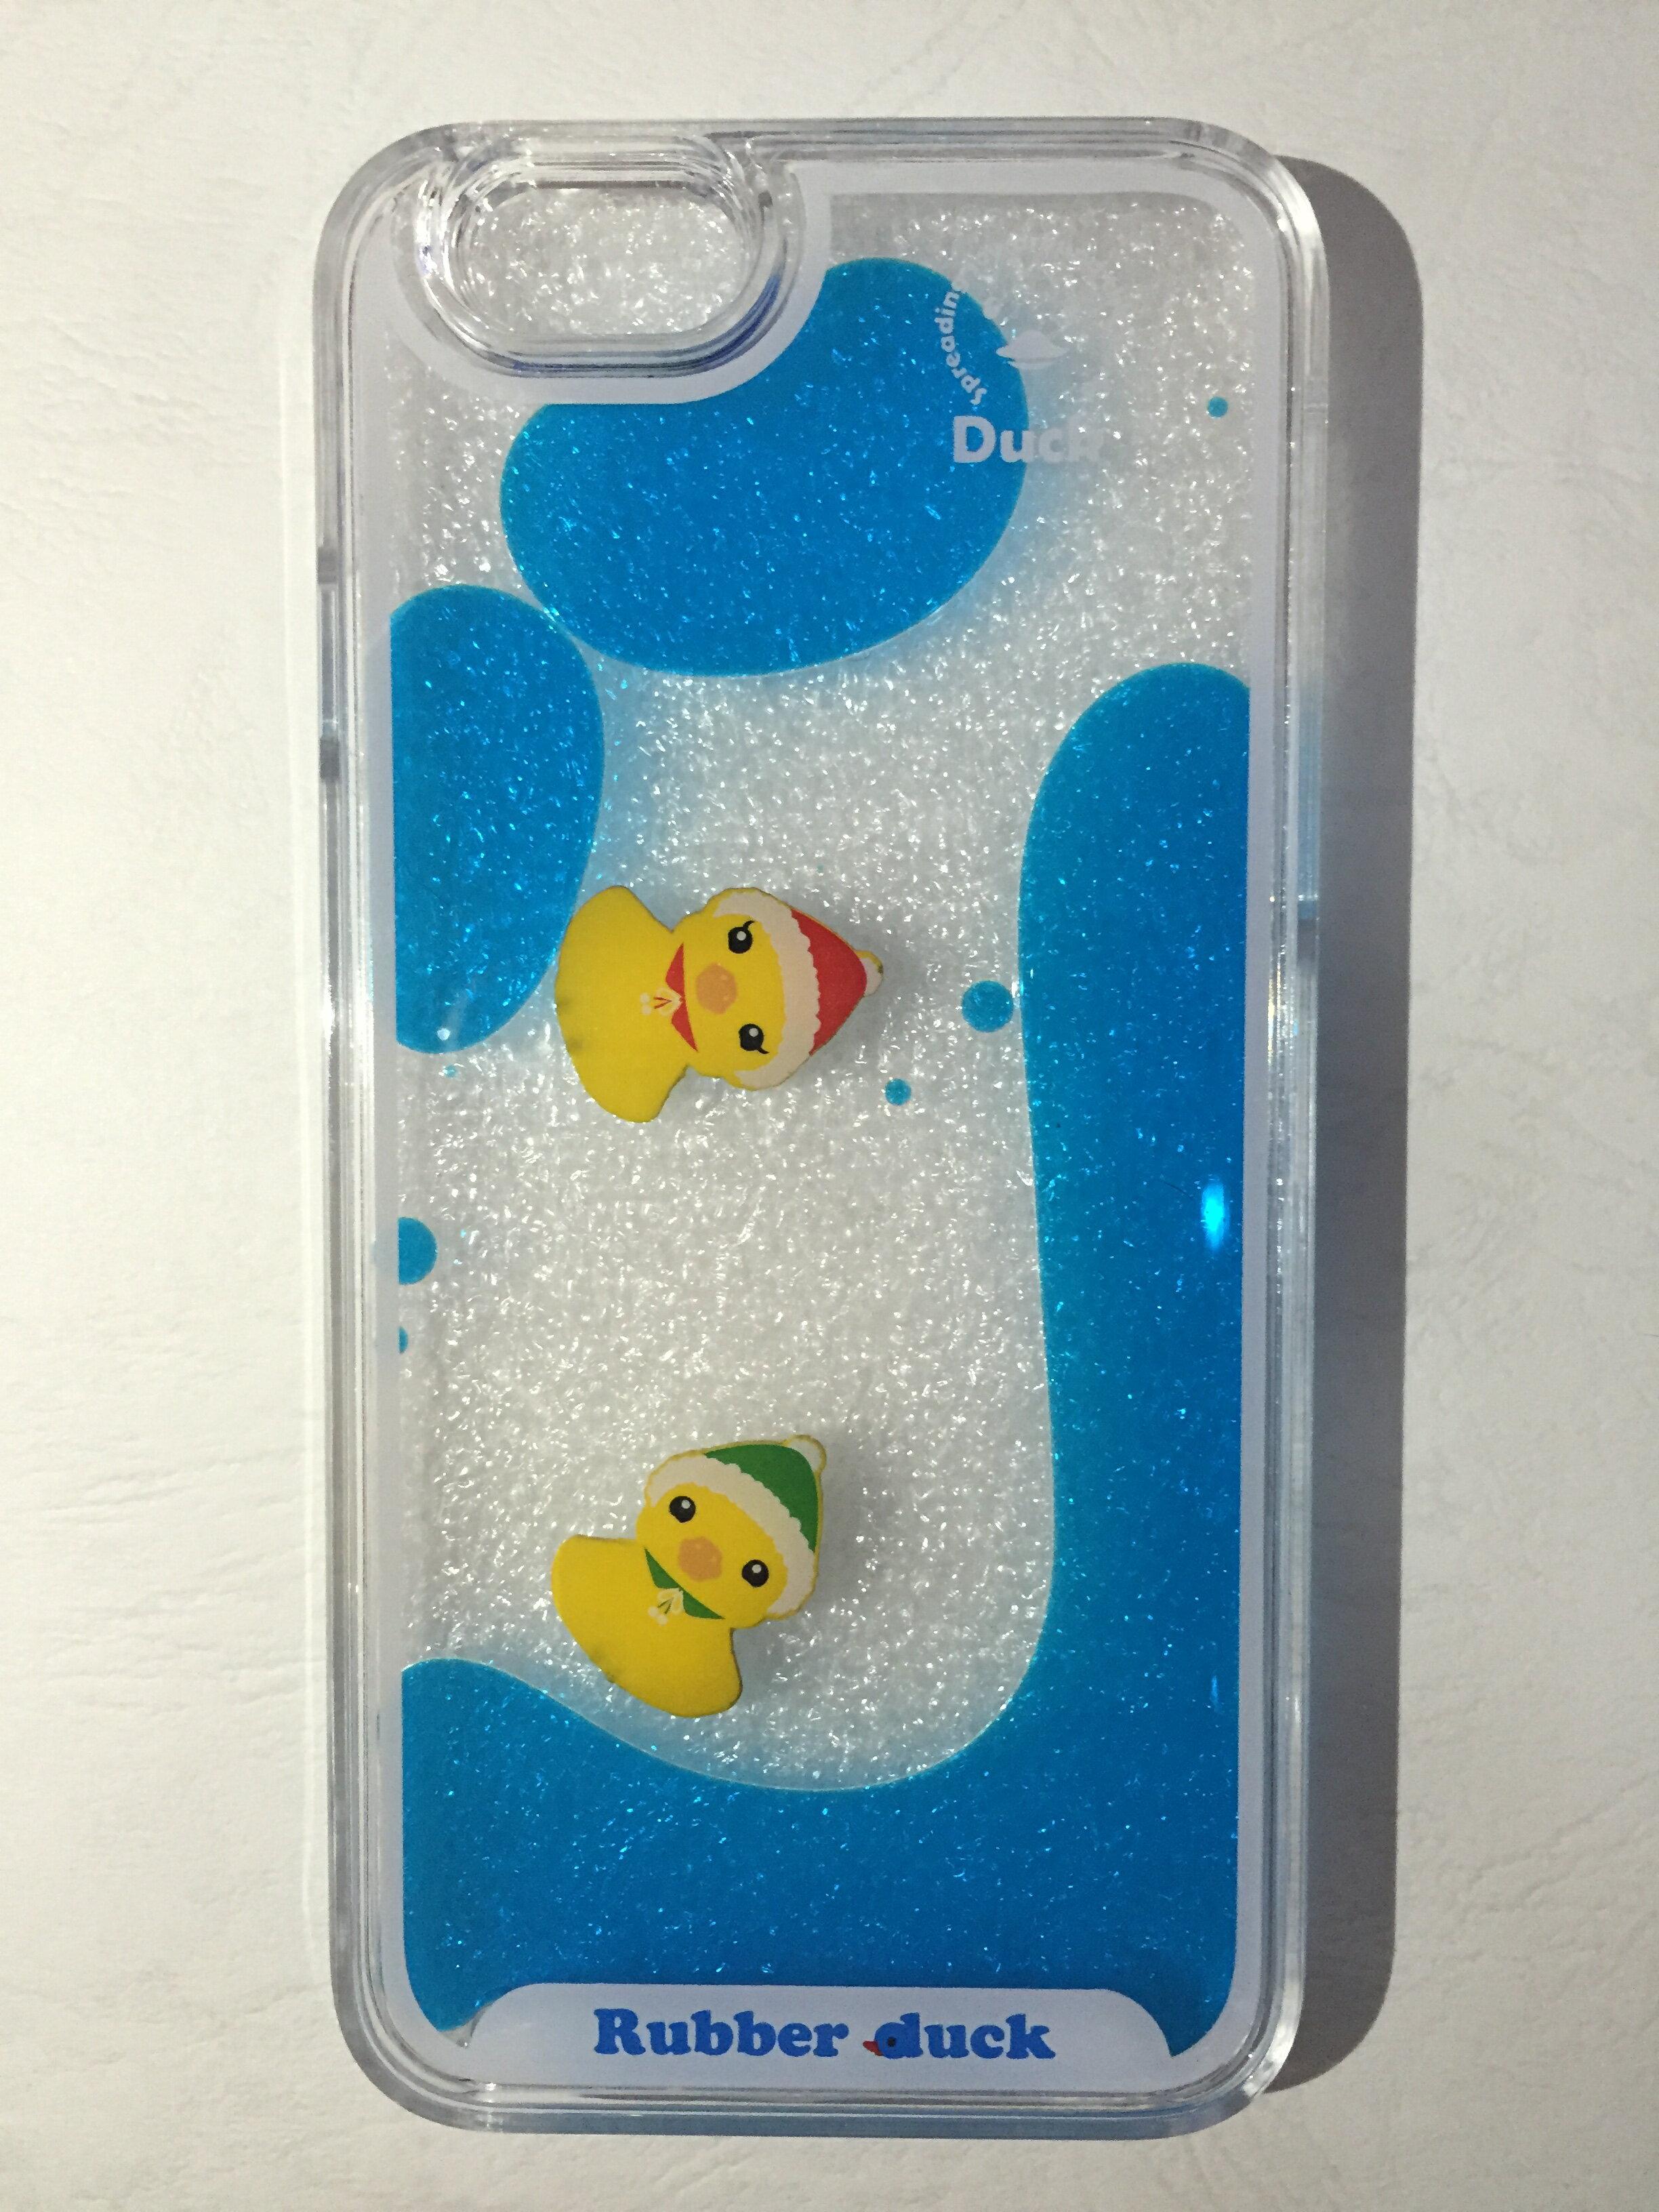 ELK 蘋果IPHONE6/6PLUS/6S/6SPLUS(4.7/5.5吋) 韓國 漂浮黃色小鴨 手機殼 保護套 液態 透明 硬殼